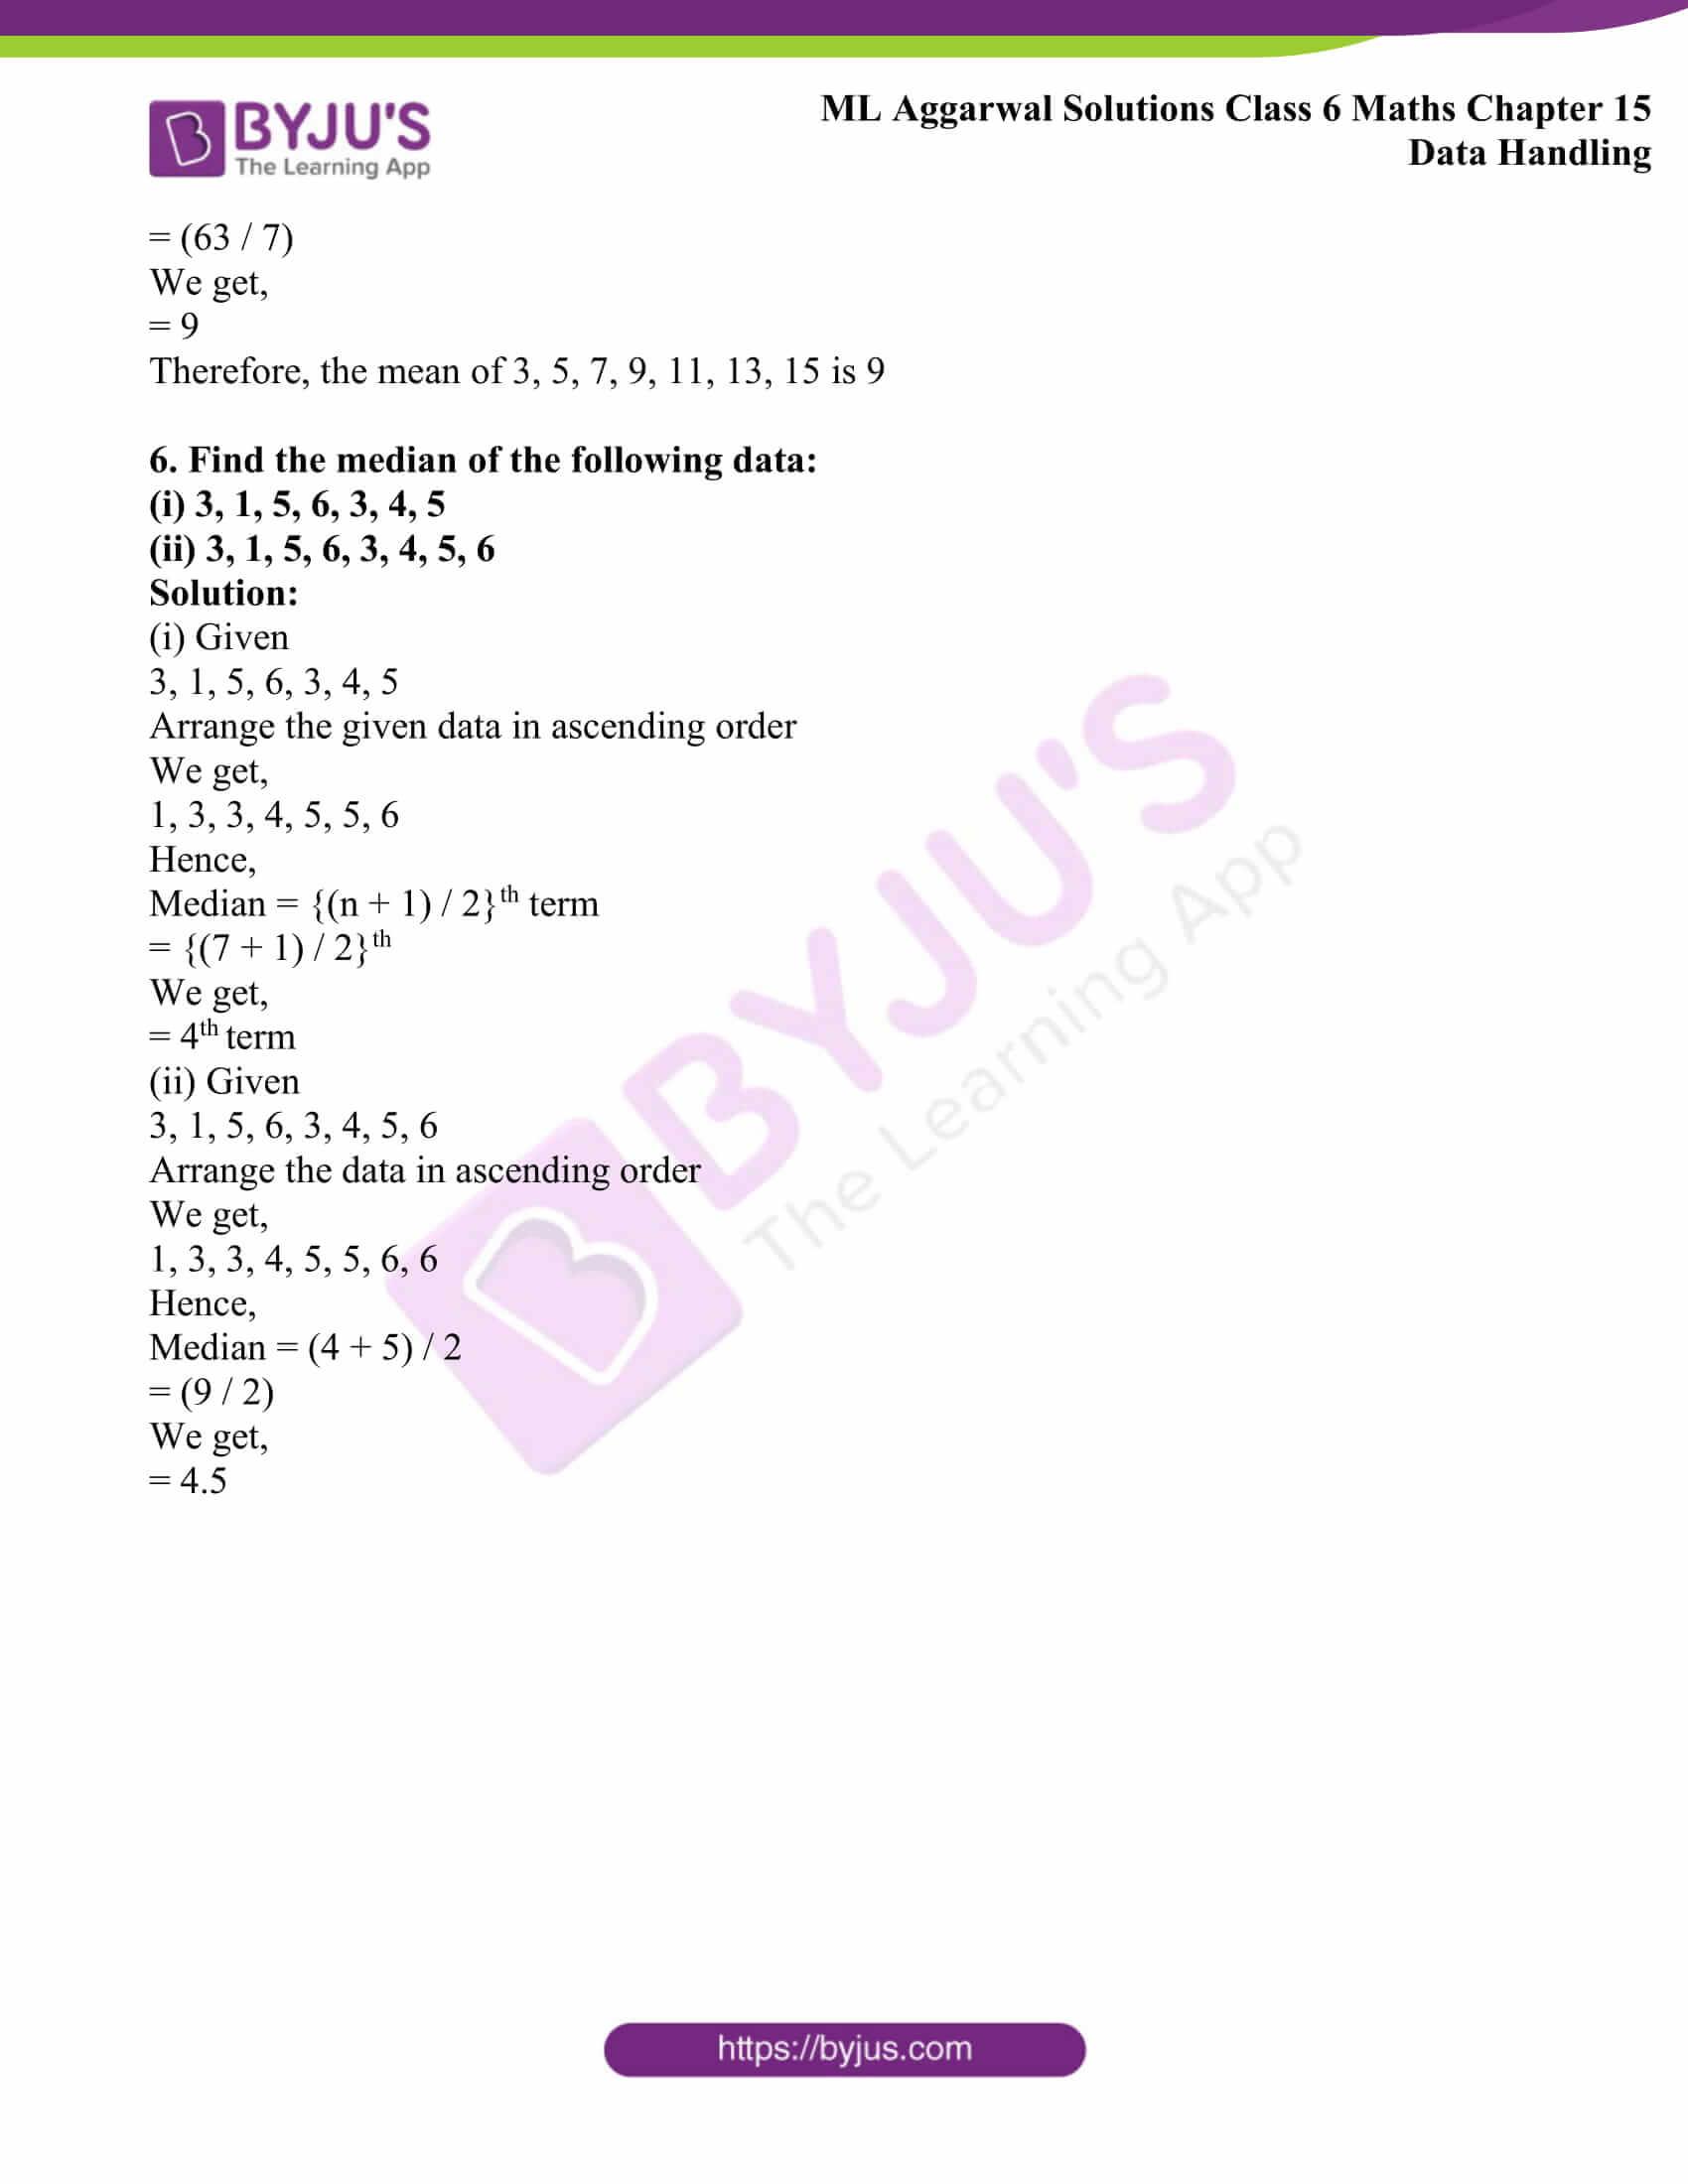 ml aggarwal sol class 6 maths chapter 15 4